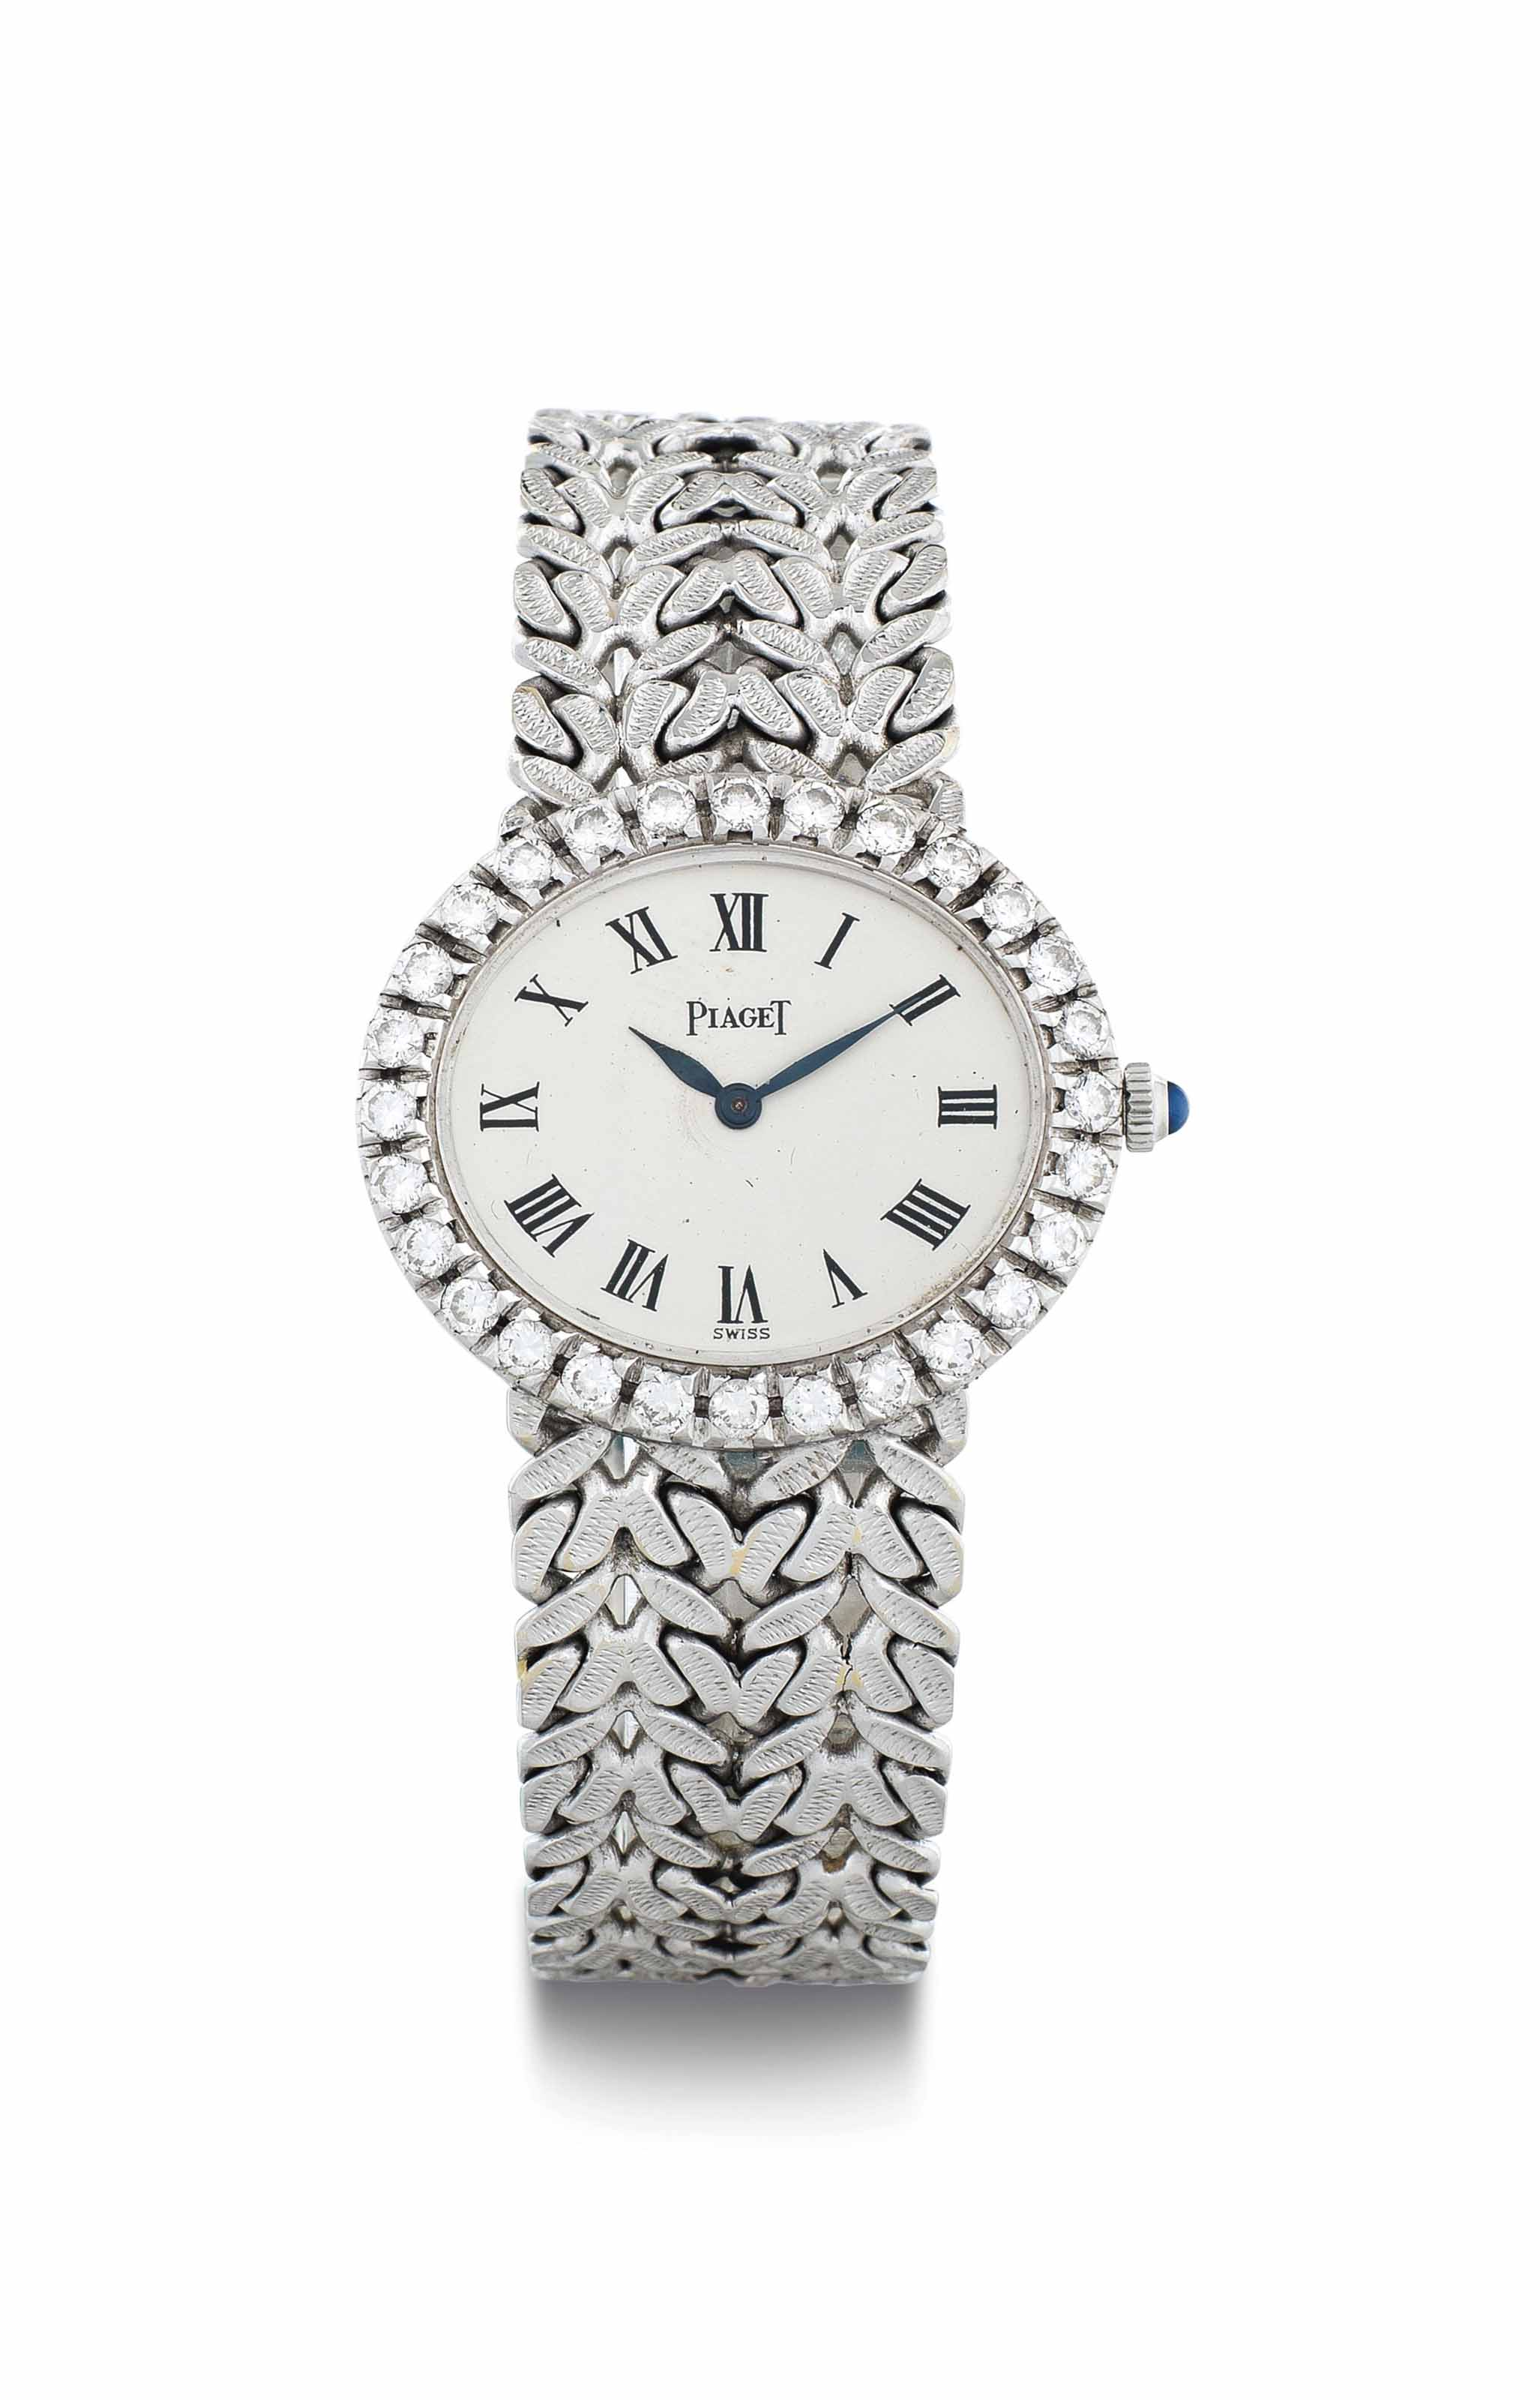 Piaget. A Lady's 18k White Gold and Diamond-Set Wristwatch with Bracelet